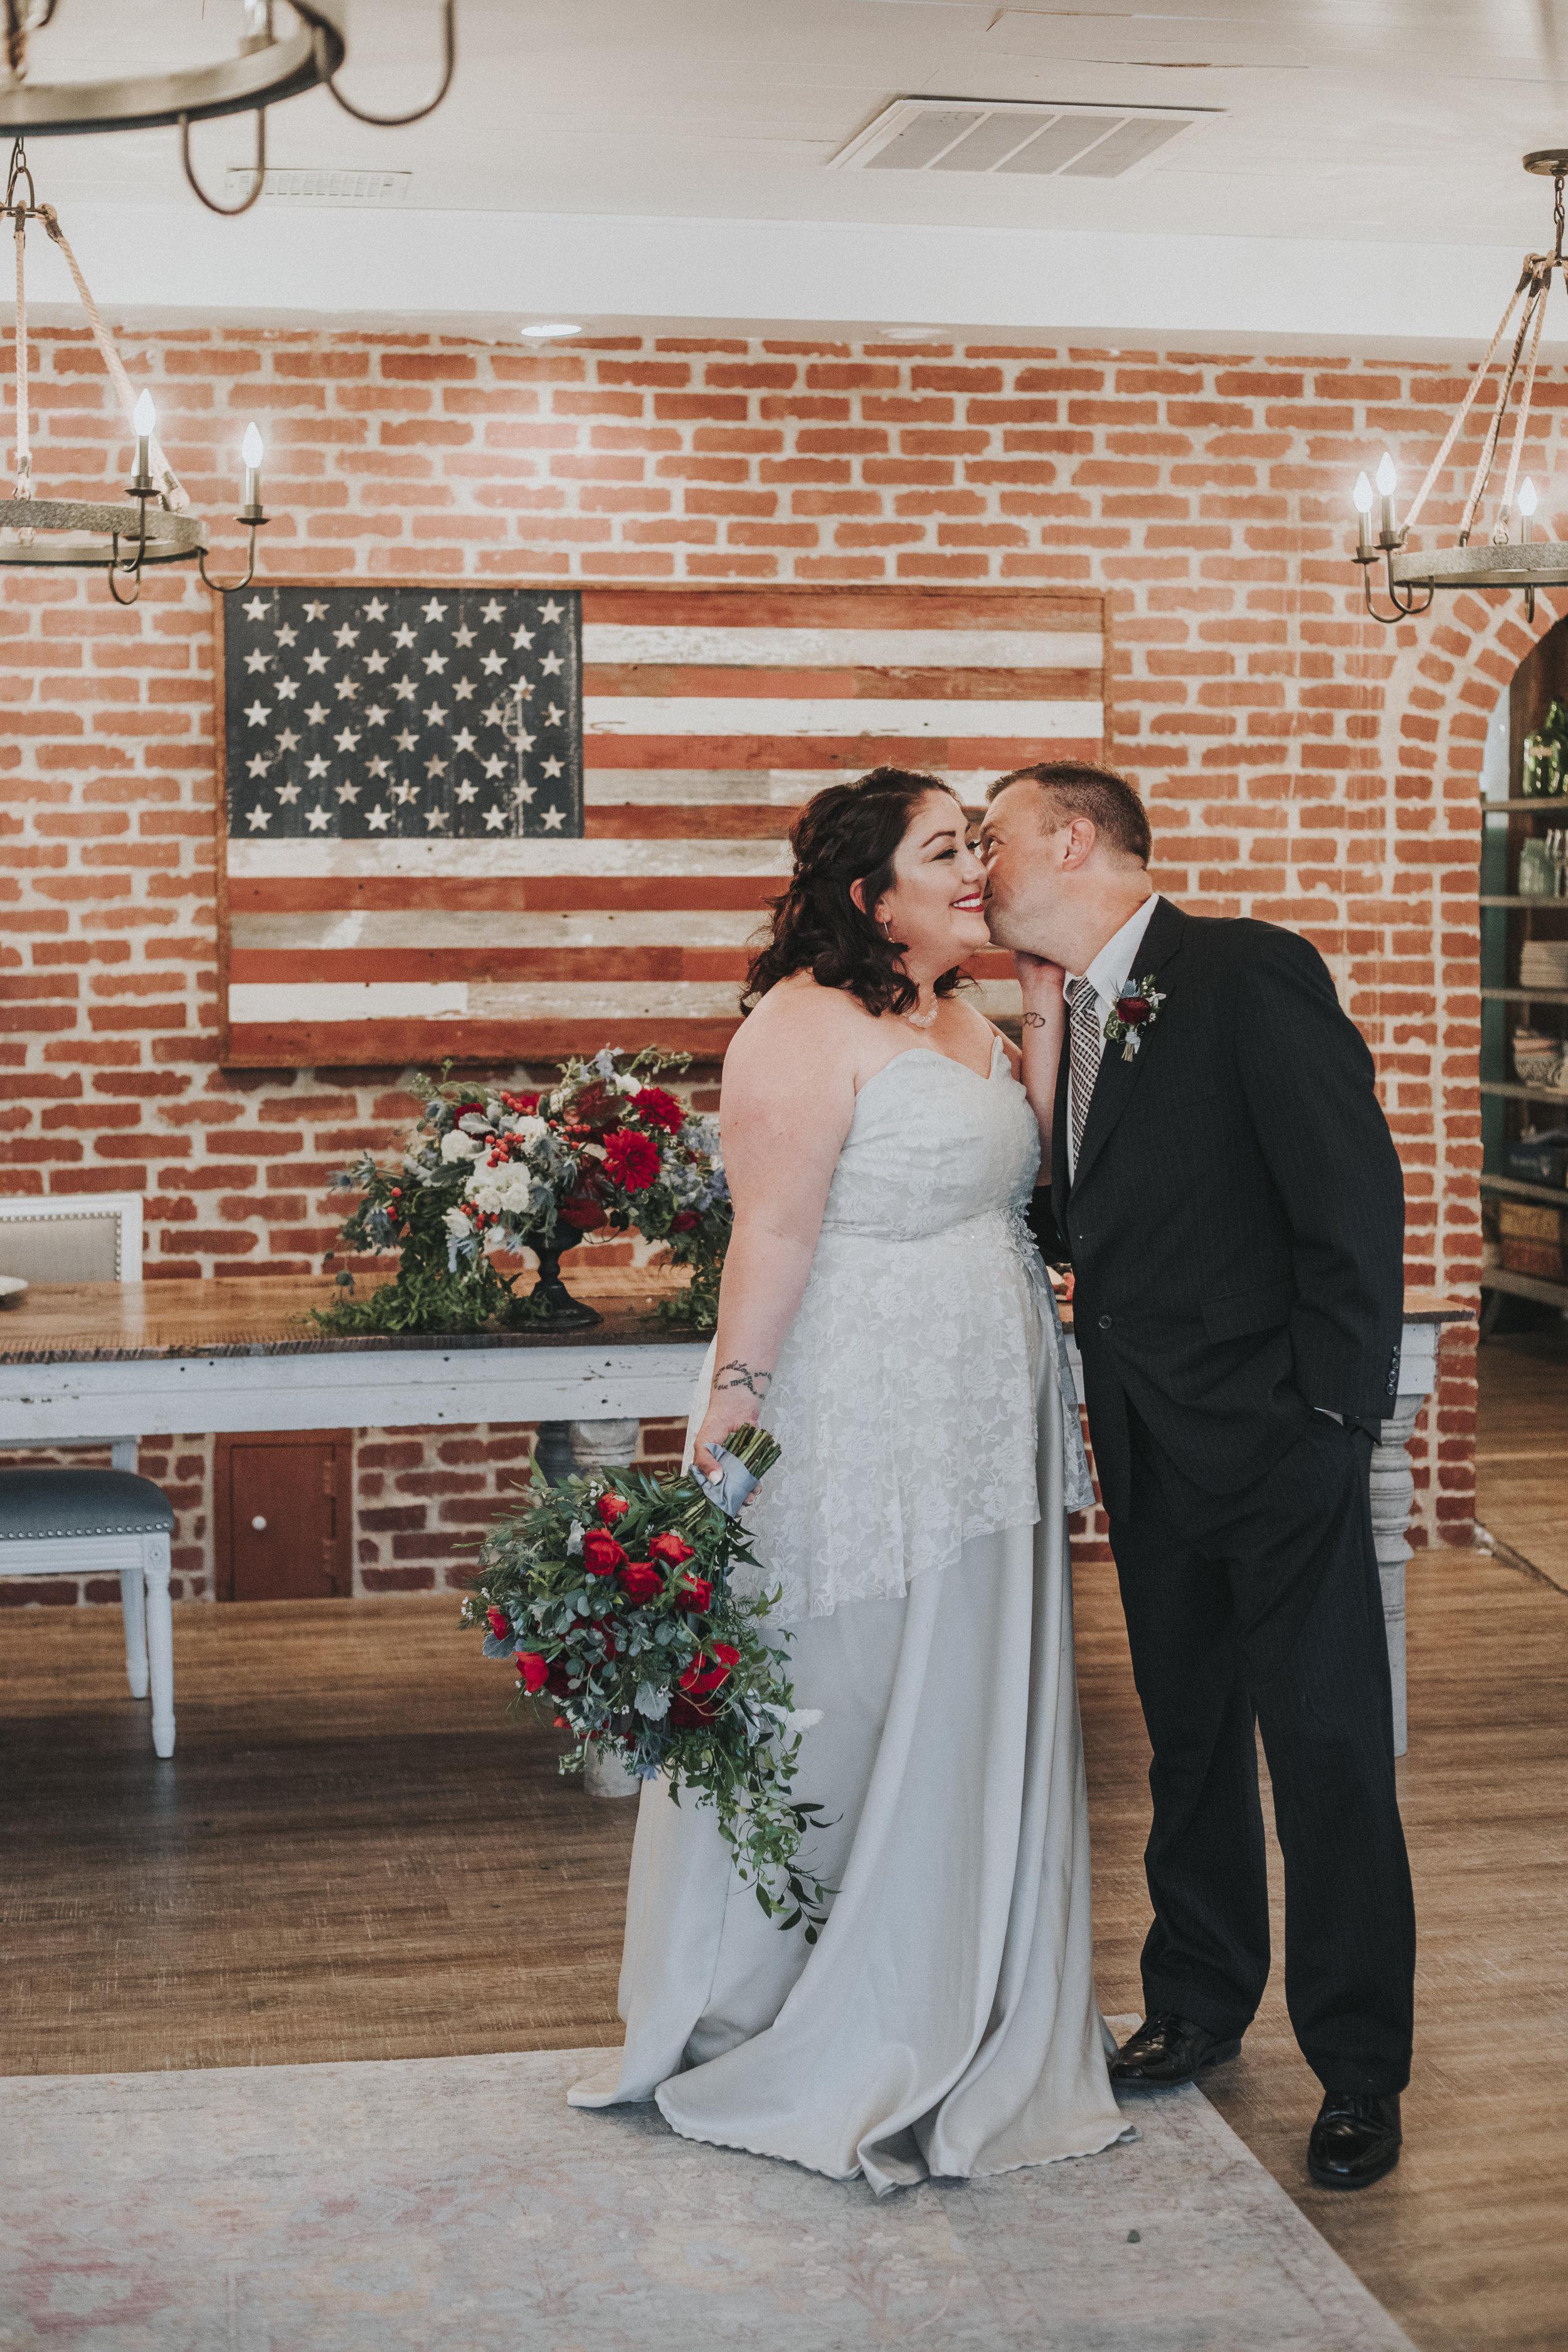 93 midwest-colorado-nebraska-elopement-photography-gretna-turtledoves_1.jpg